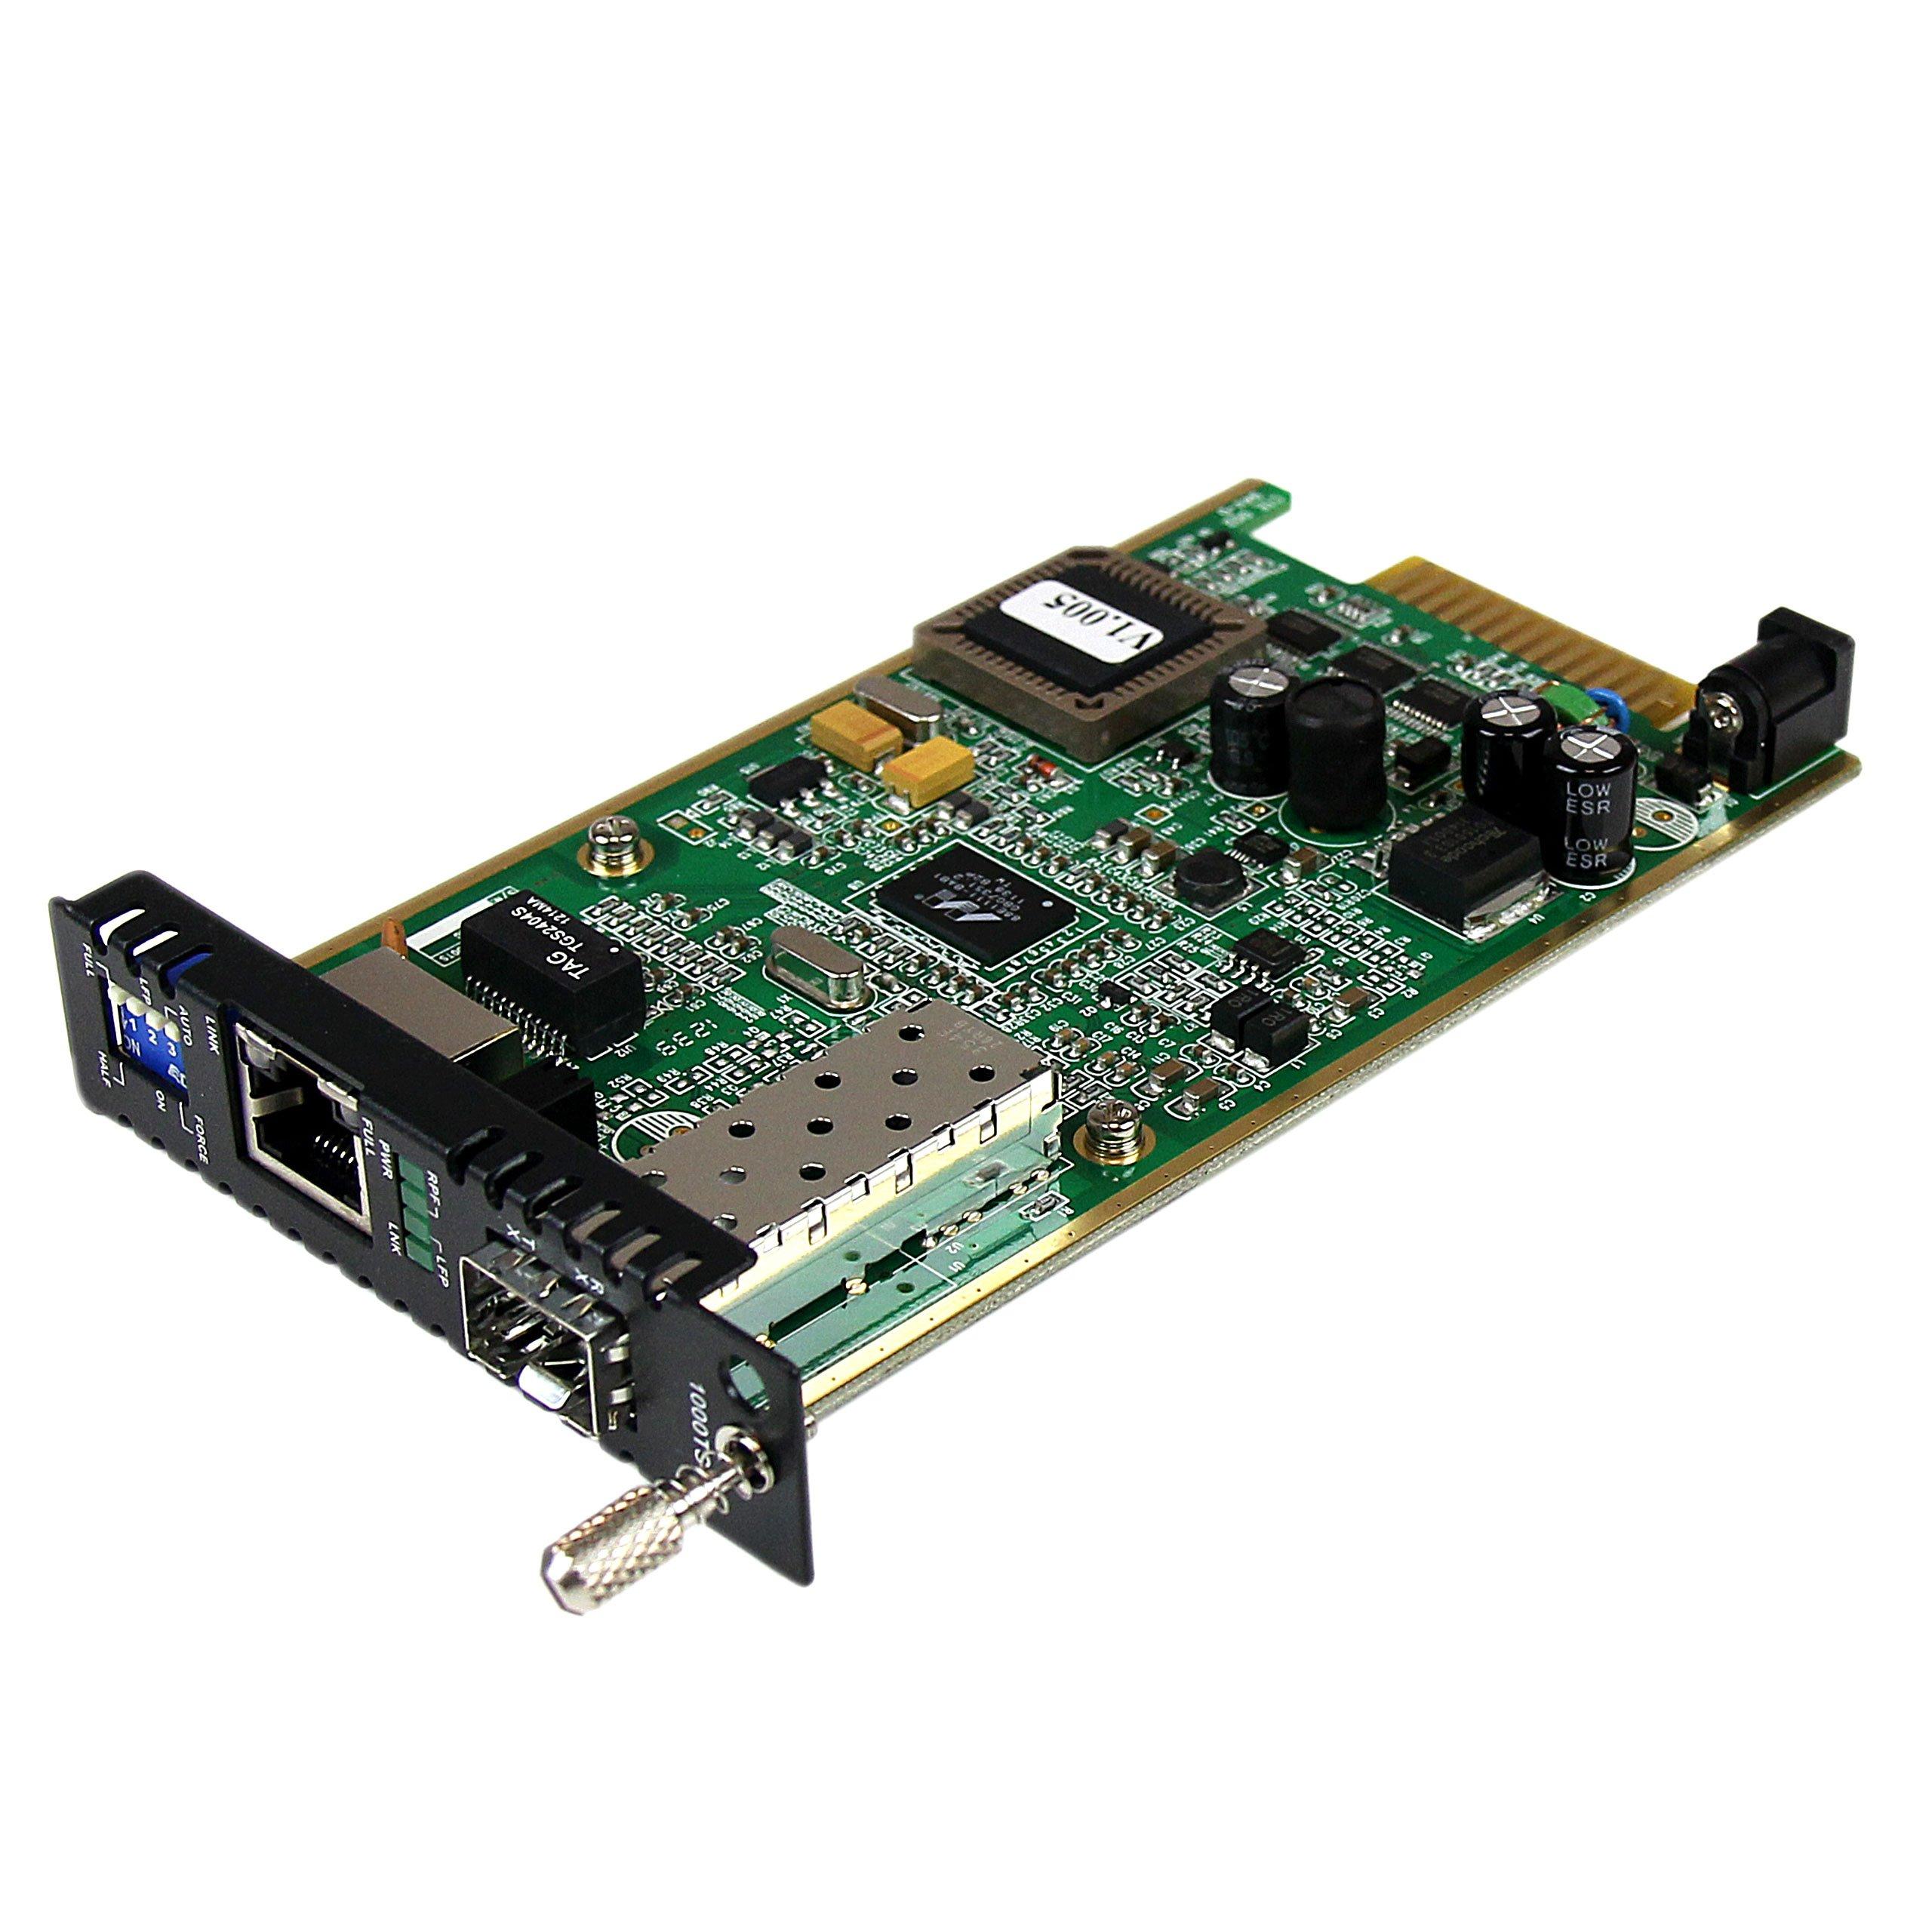 StarTech.com Gigabit Ethernet Fiber Media Converter Card Module with Open SFP Slot (ET91000SFP2C)